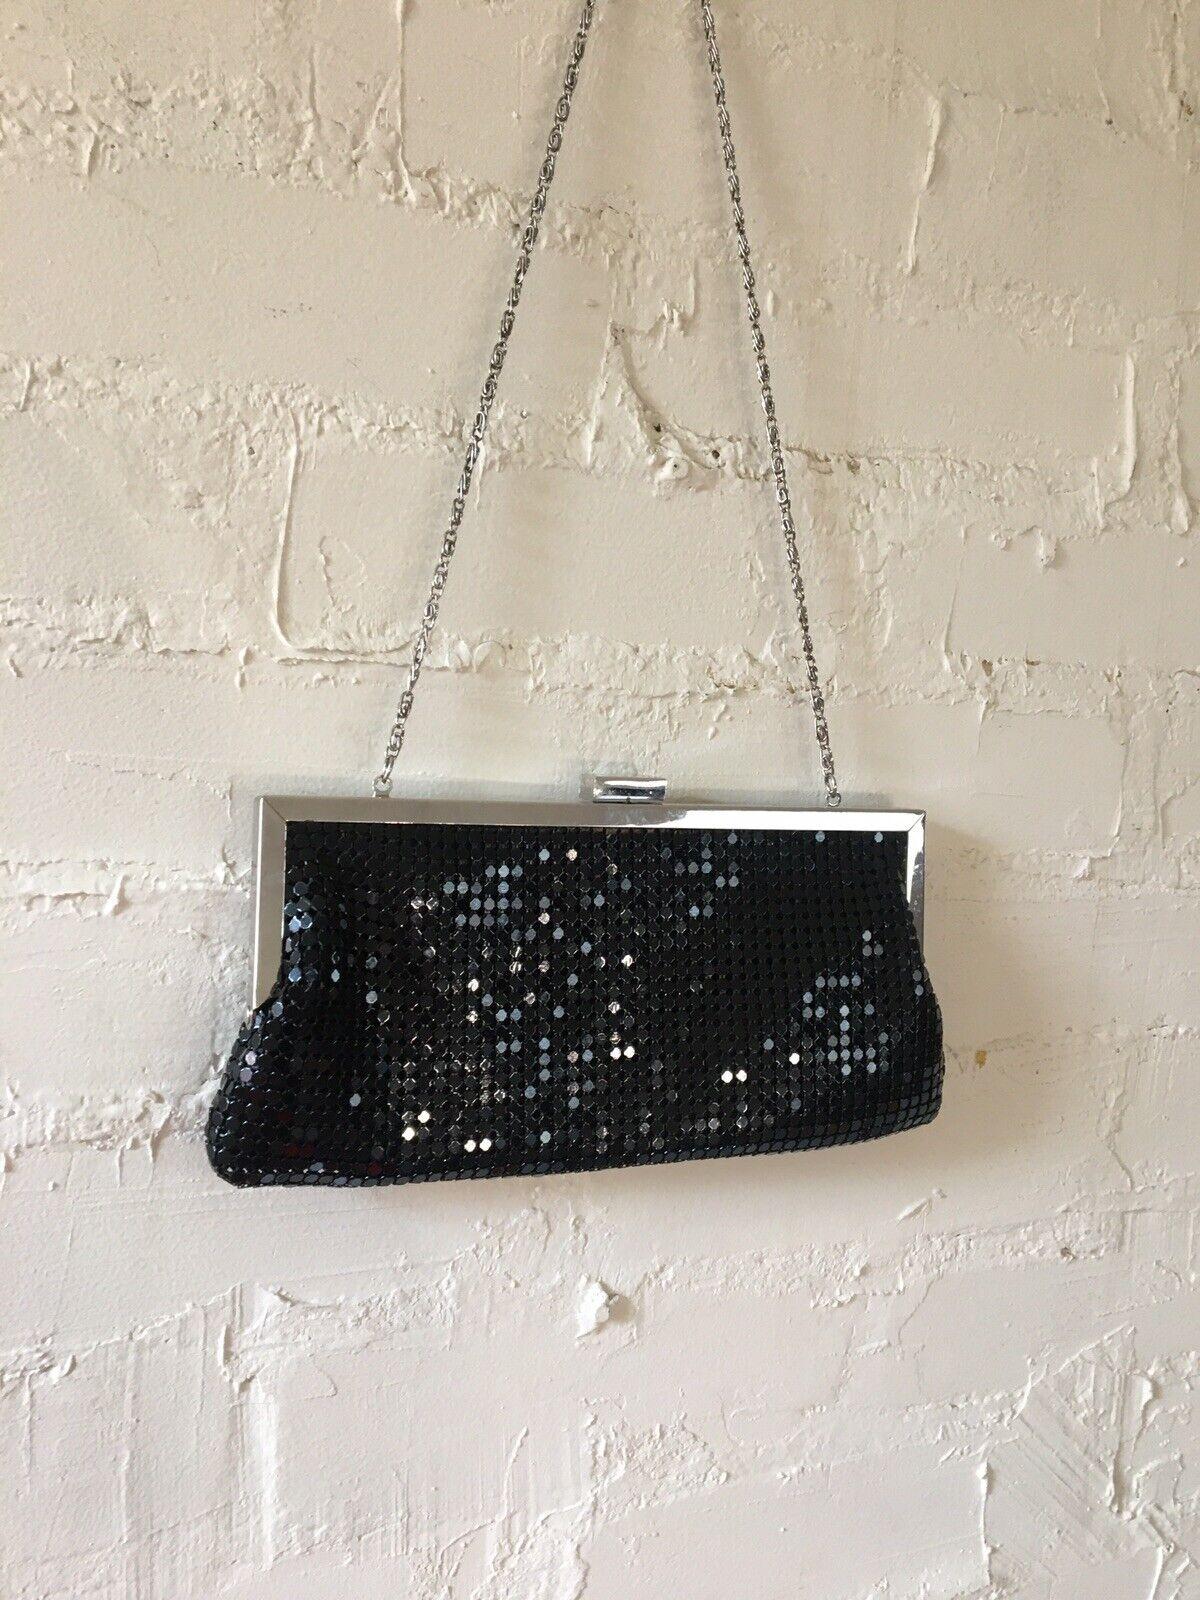 Style & Co Evening Handbag Purse Black Metal